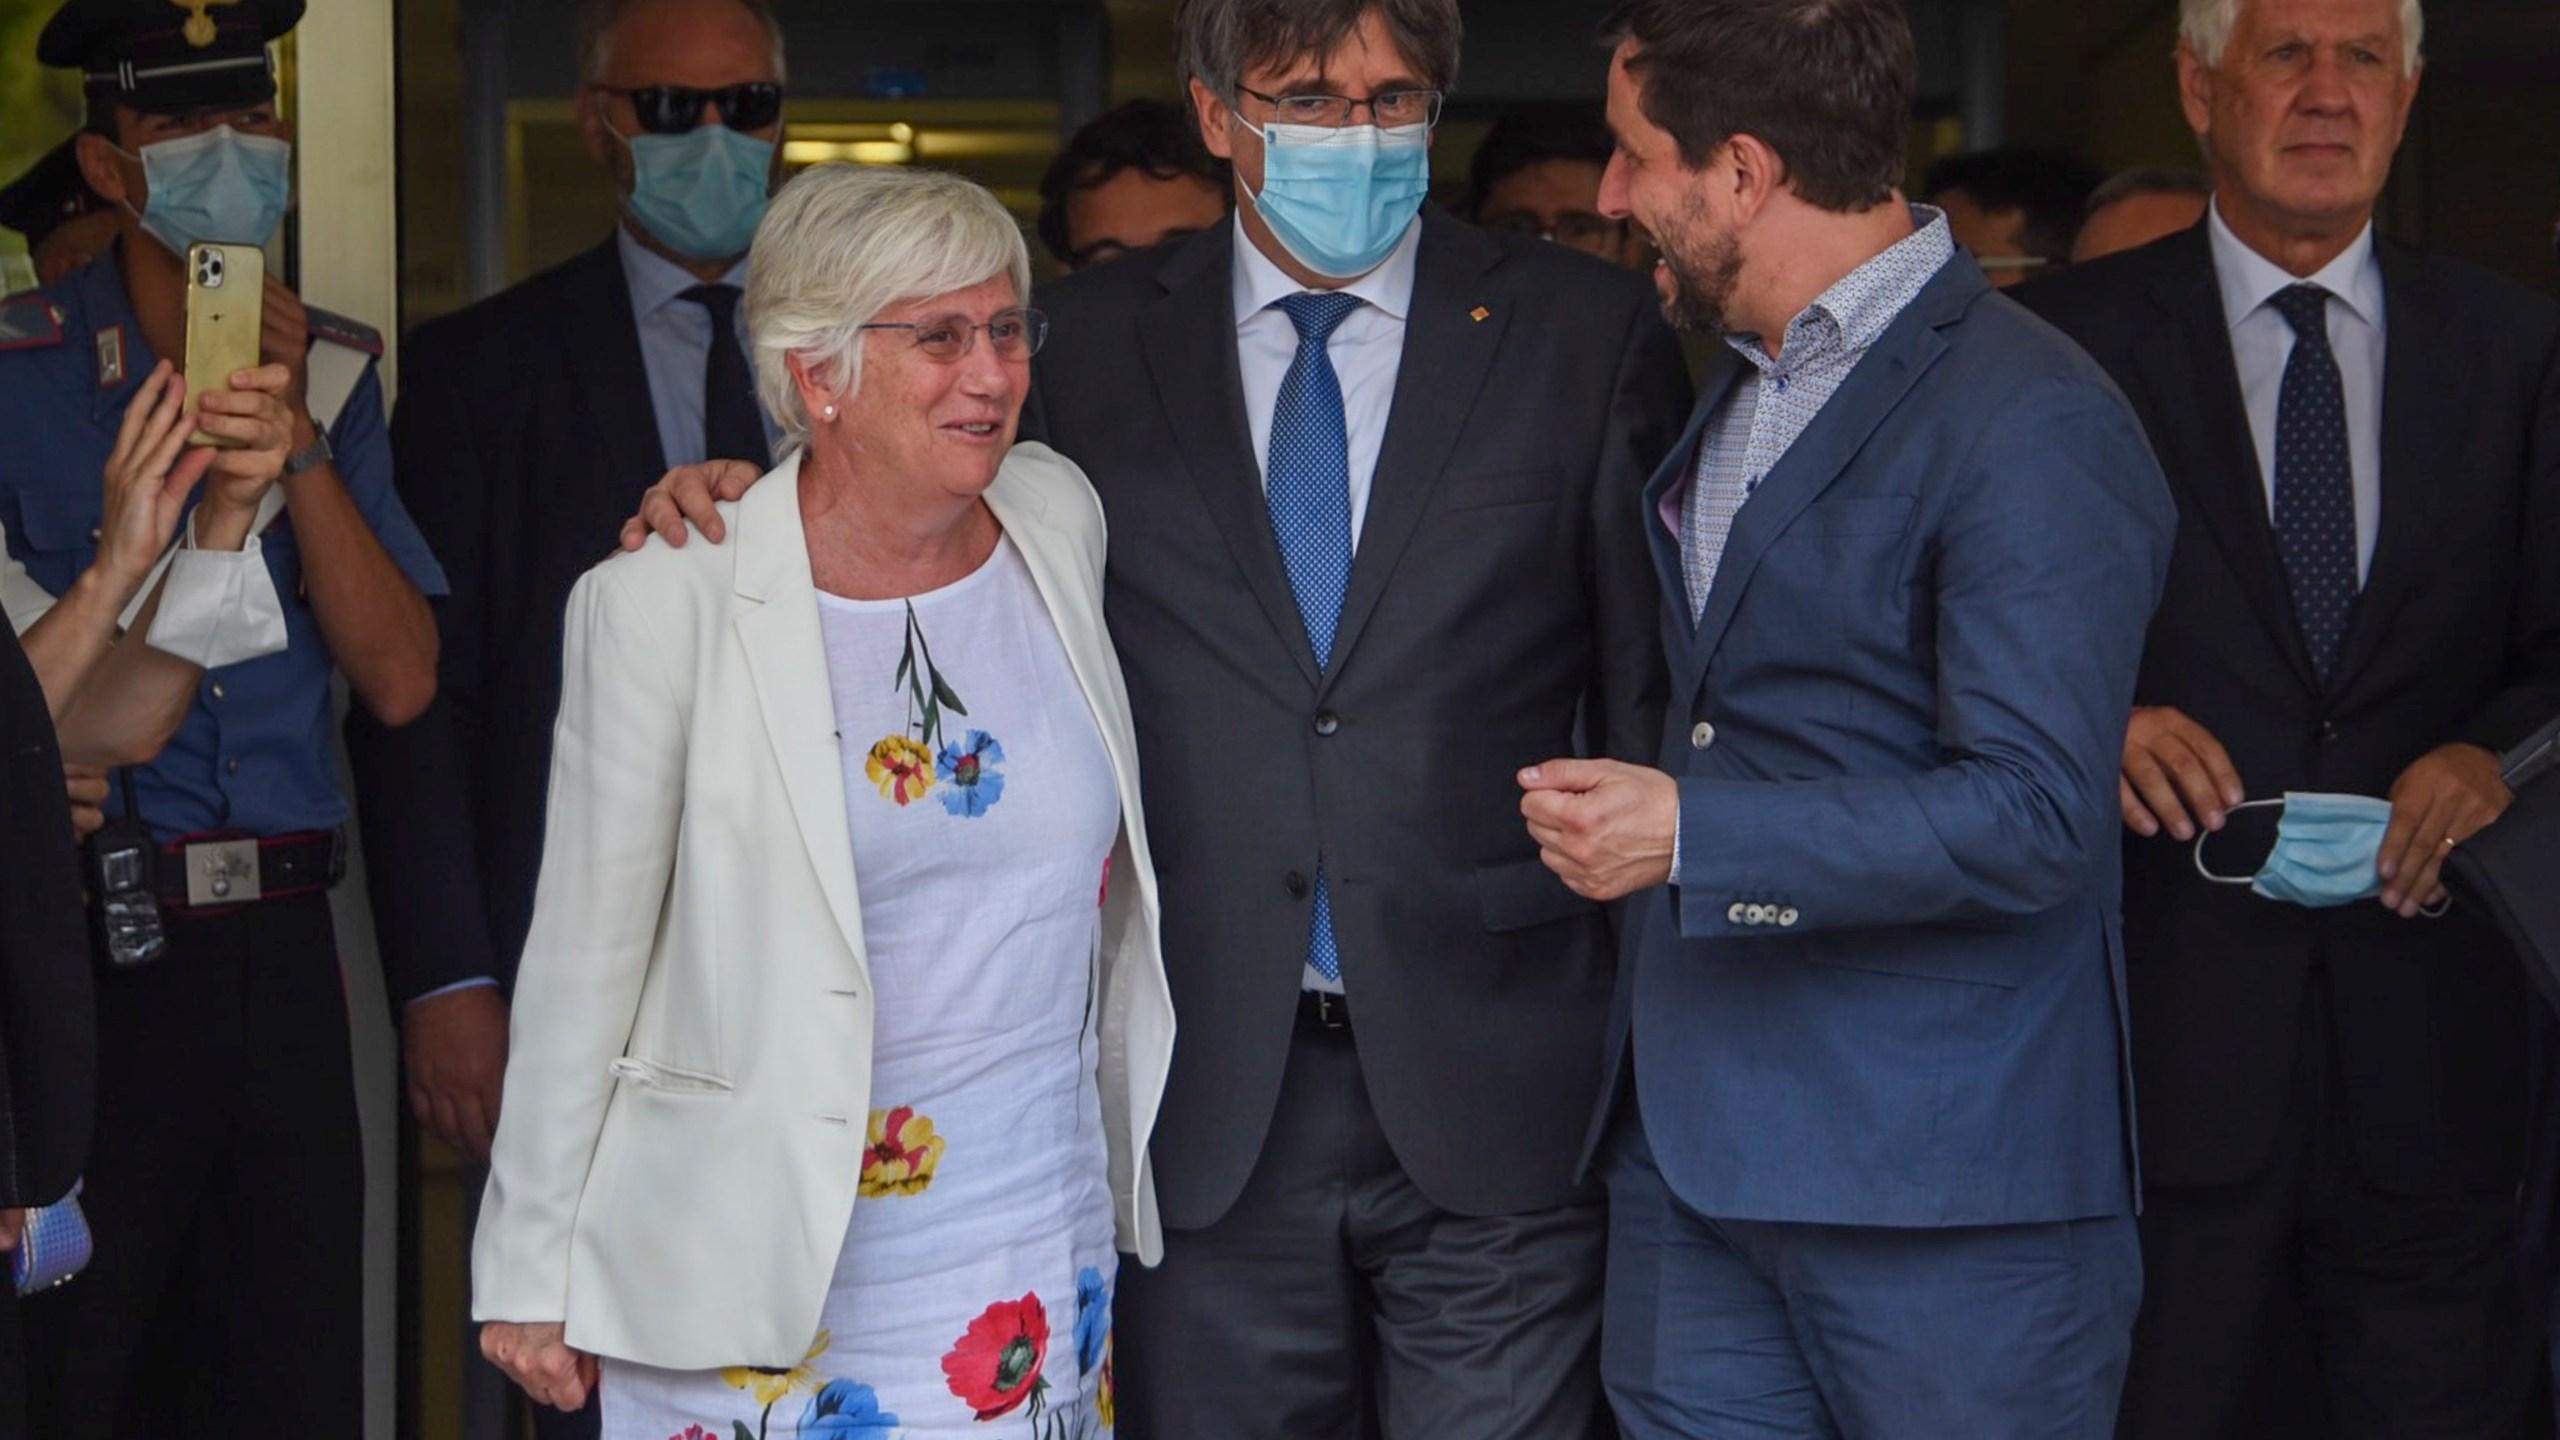 Carles Puigdemont, Agostinangelo Marras, Antoni Comin, Clara Ponsati